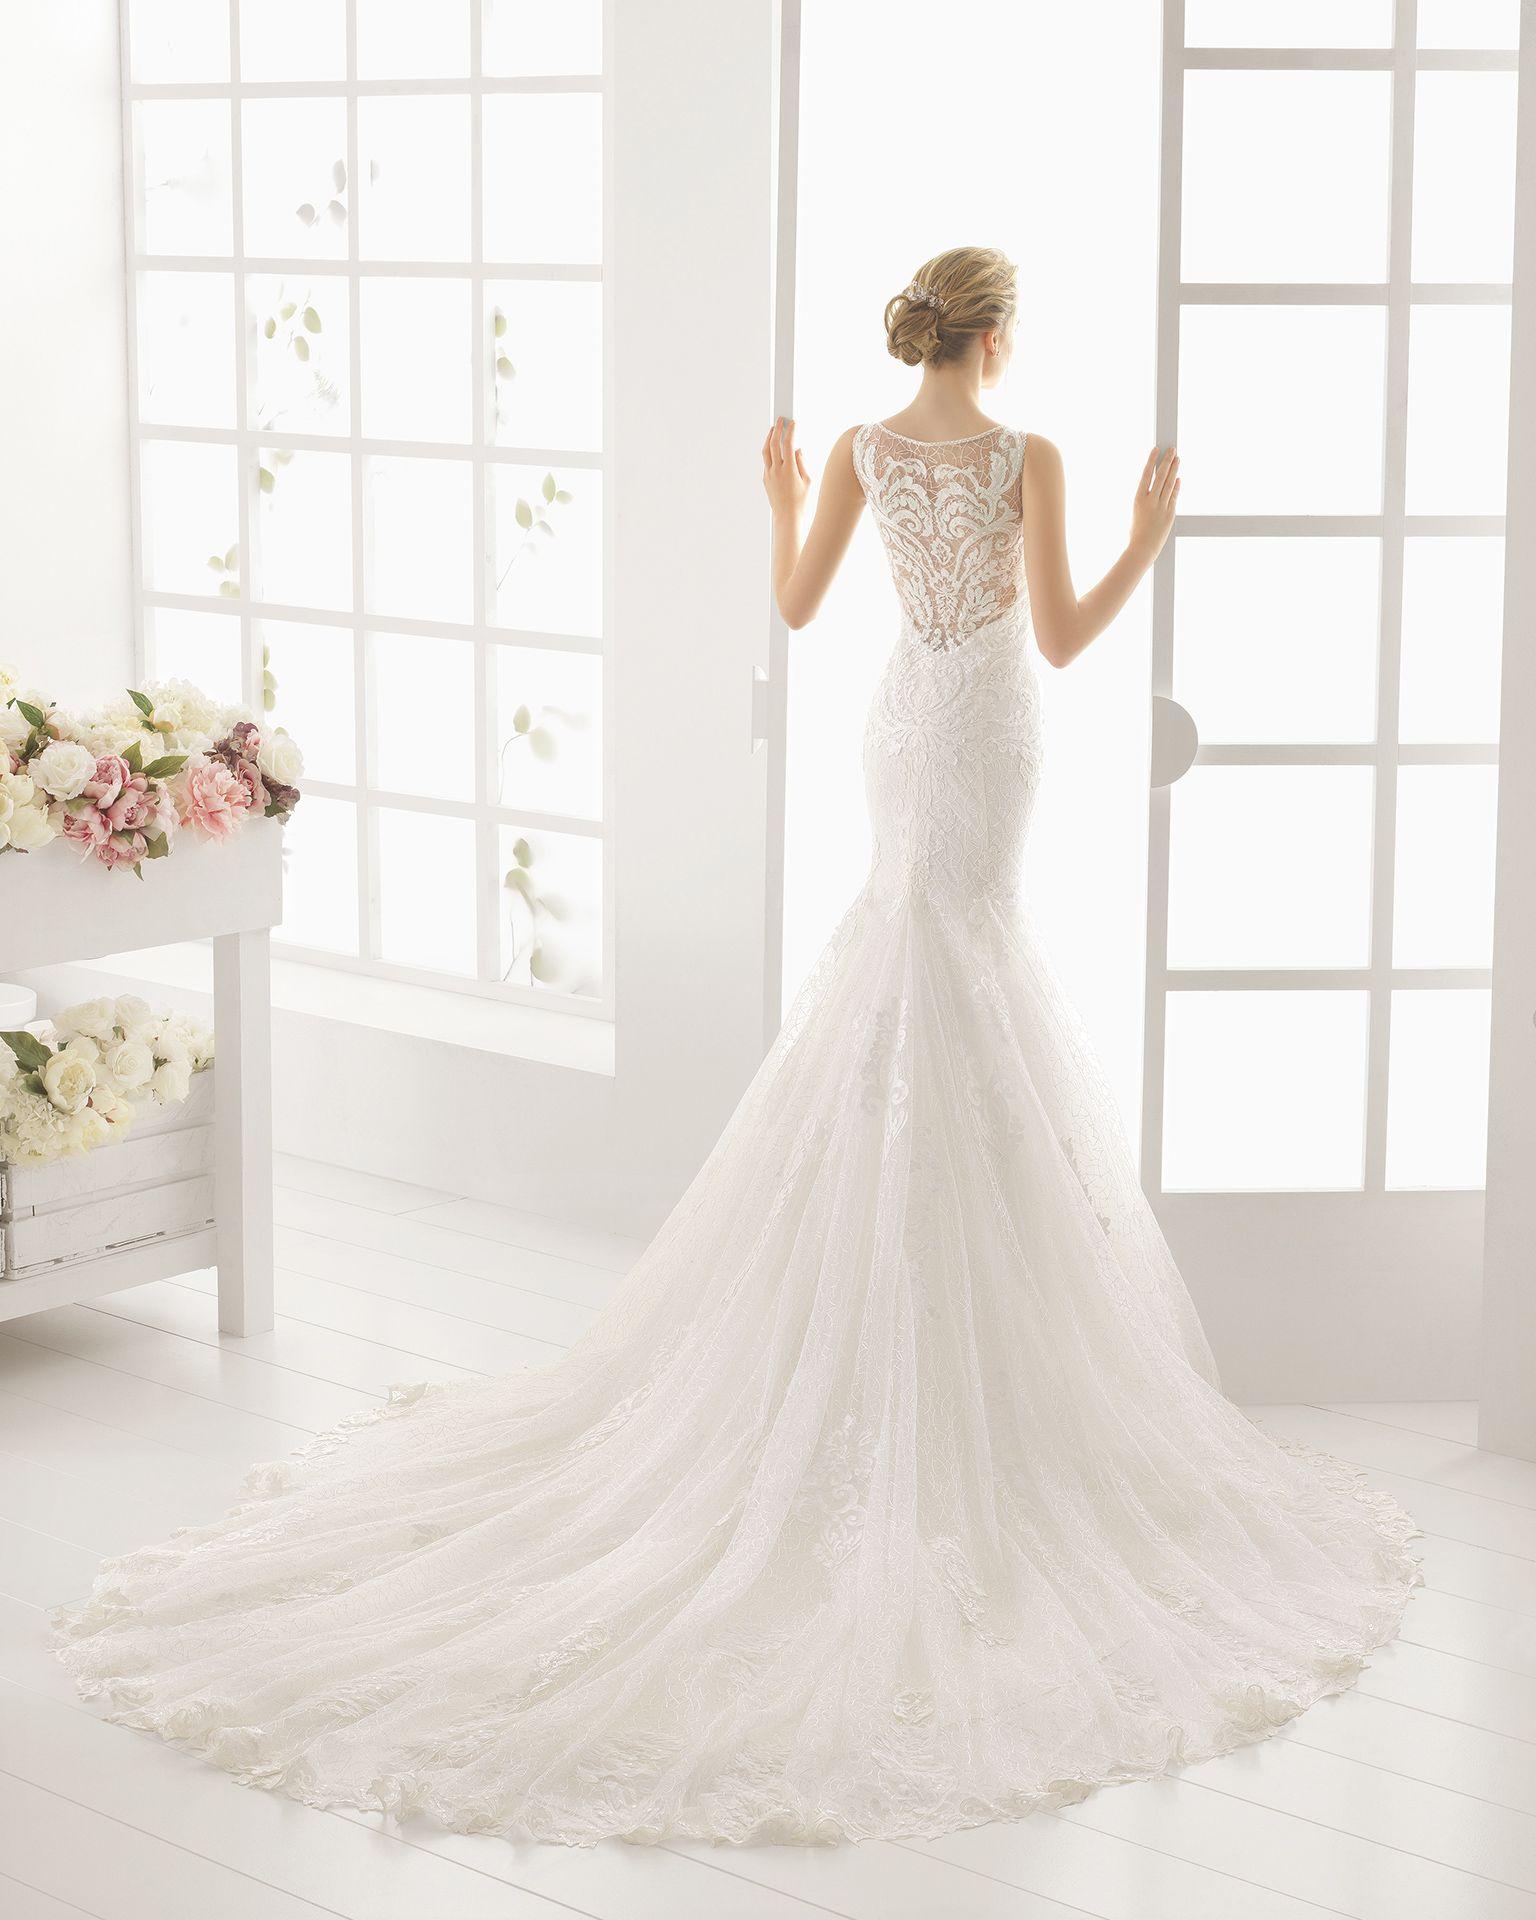 MARTINA traje de novia en encaje y pedreria. | Betty | Pinterest ...